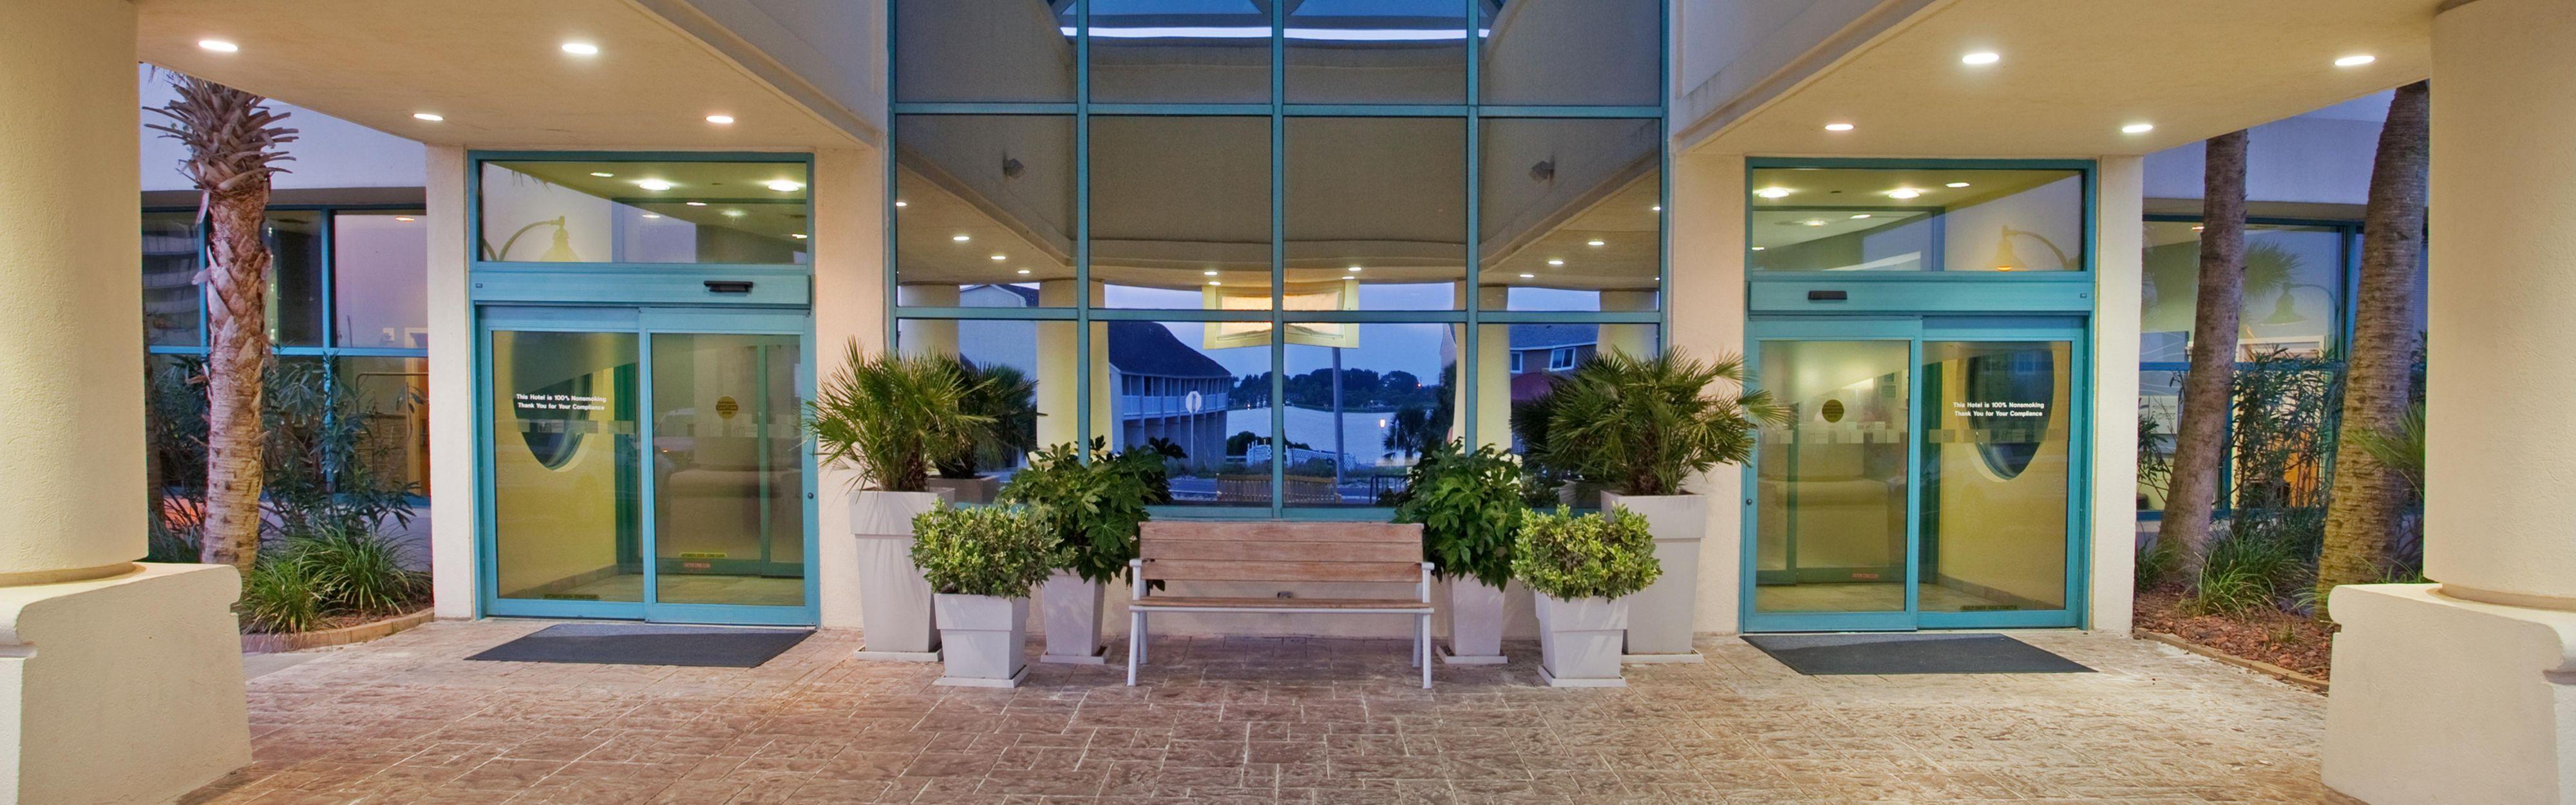 Fabulous Pet Friendly Hotels Pensacola Beach With